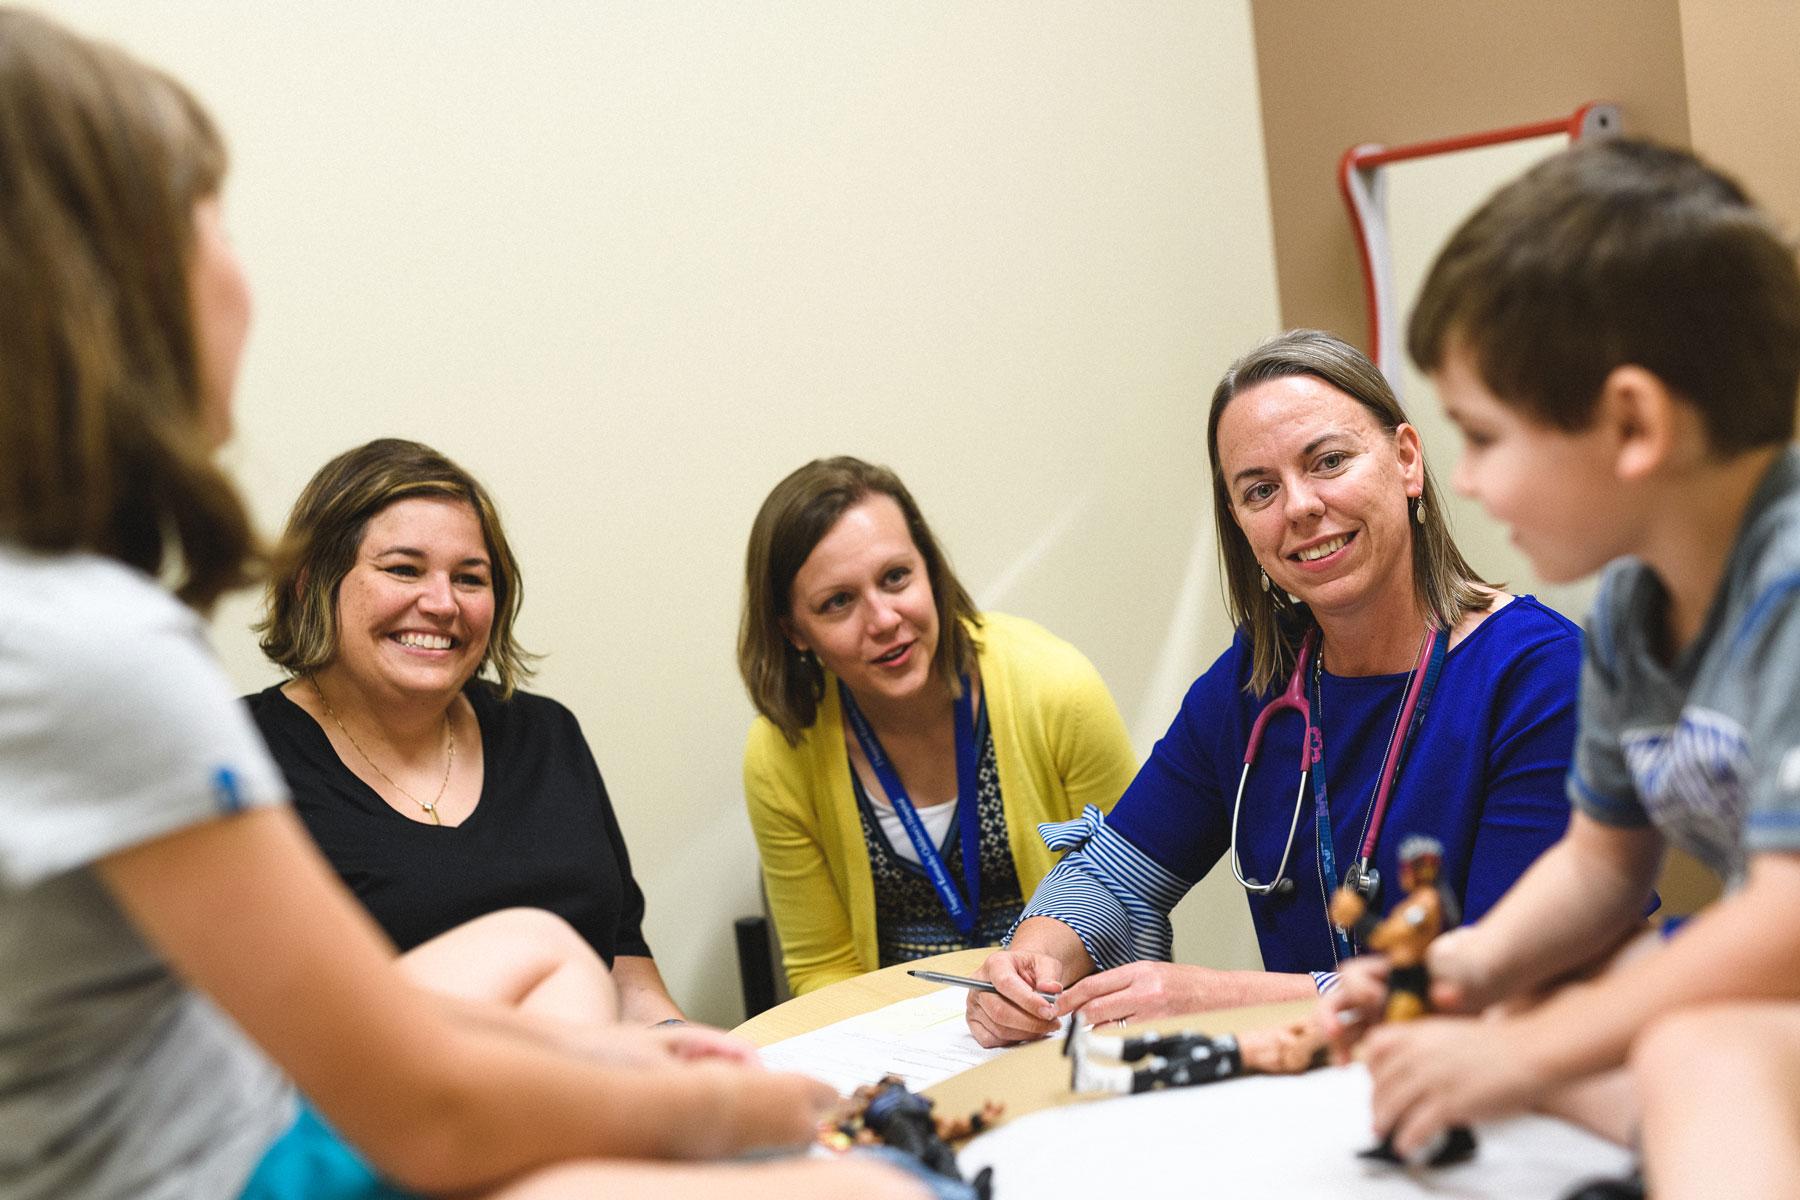 Kara, Max and Lisa work with diabetes educators Angela Hepner and Deb Howard at Barnstable Brown Diabetes Center.